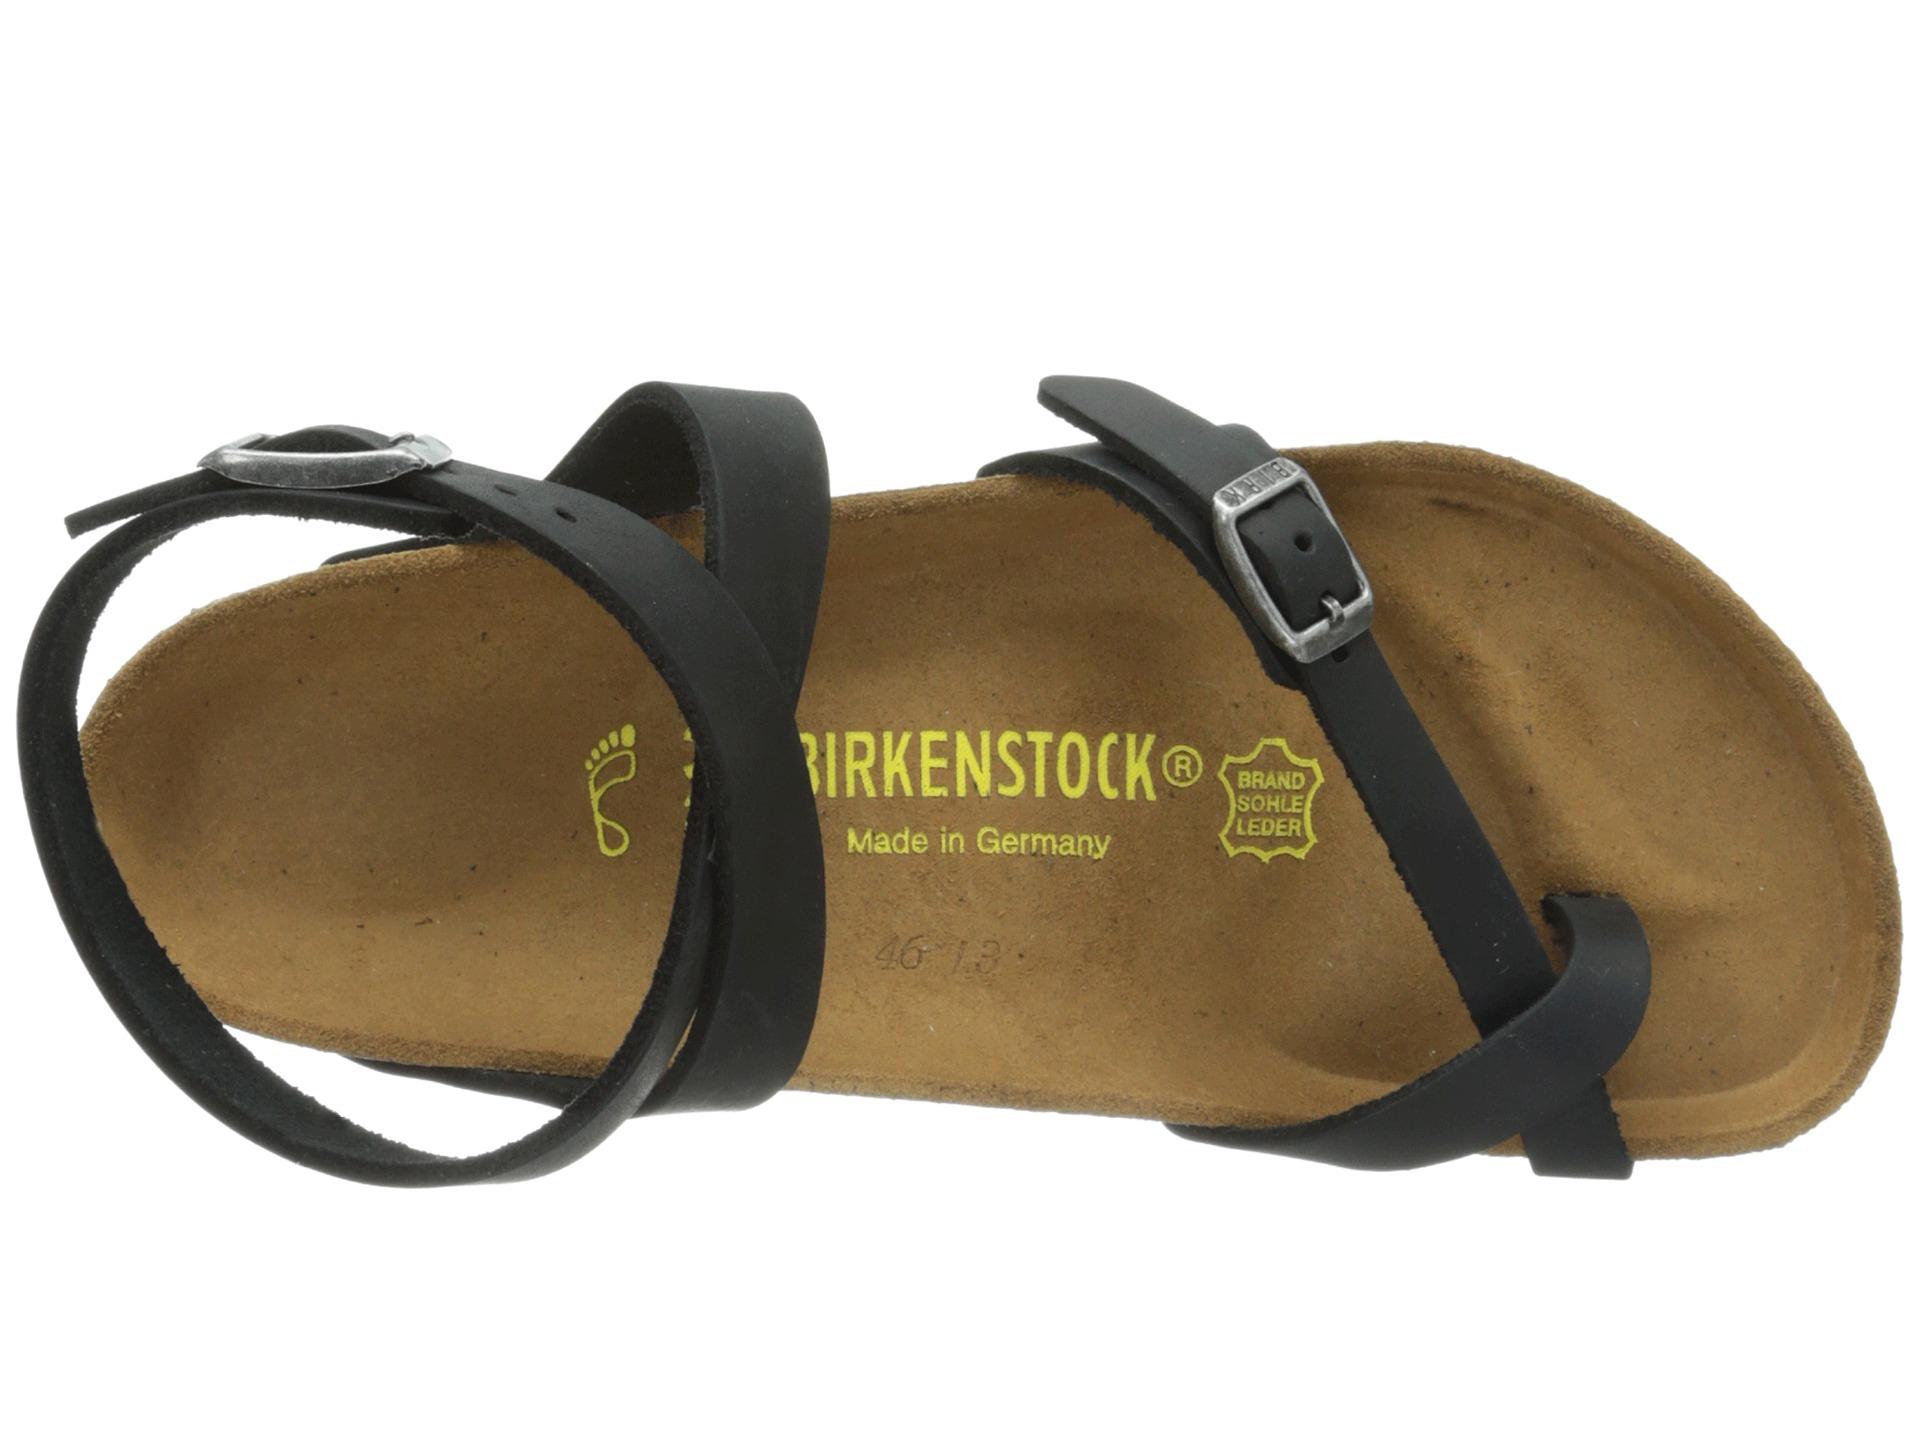 4c2ce18399e Lyst - Birkenstock Yara Oiled Leather in Black